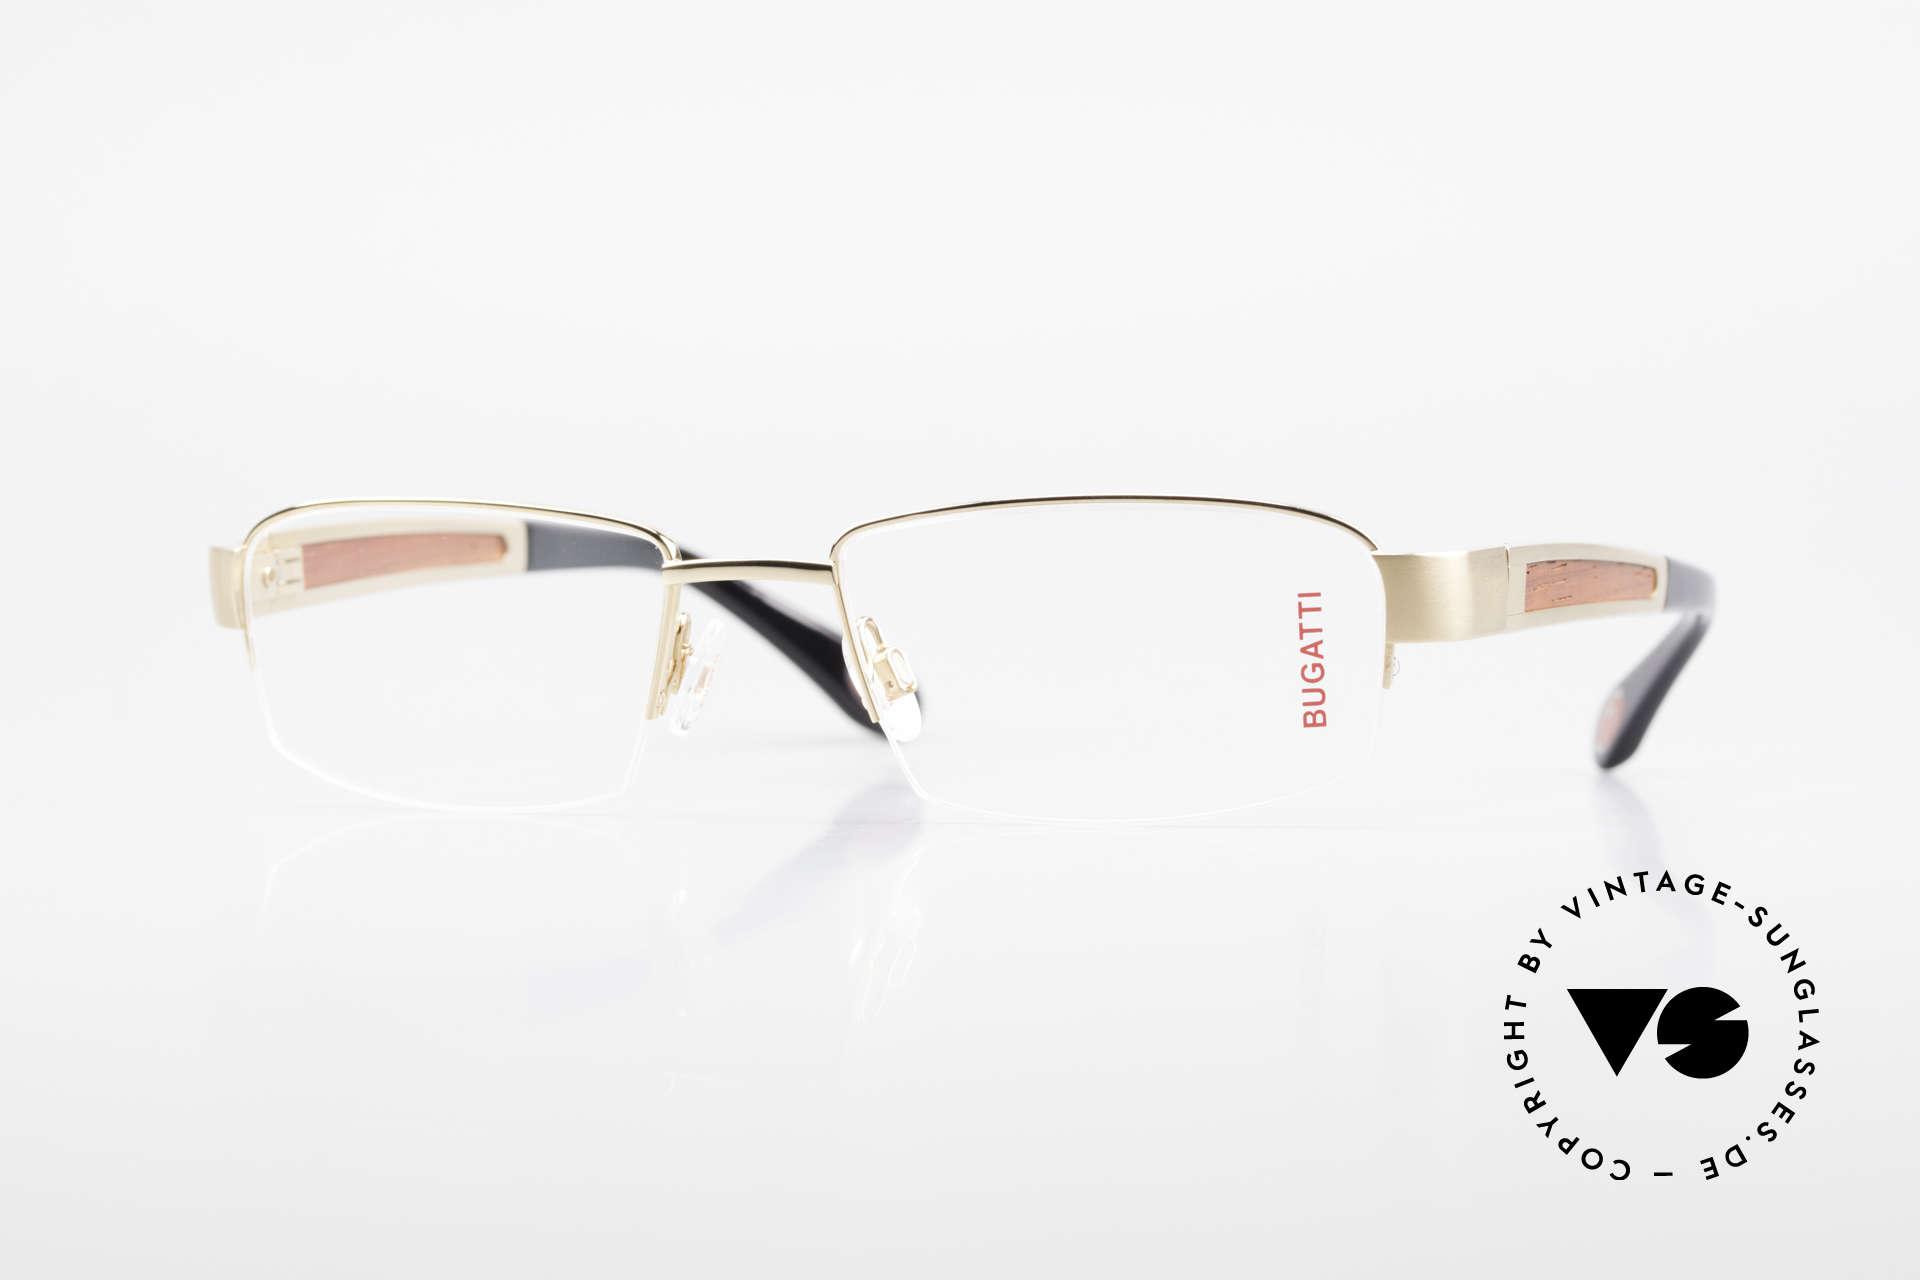 Bugatti 521 Precious Padouk Wood Gold, BUGATTI luxury eyeglasses of incredible top-quality, Made for Men